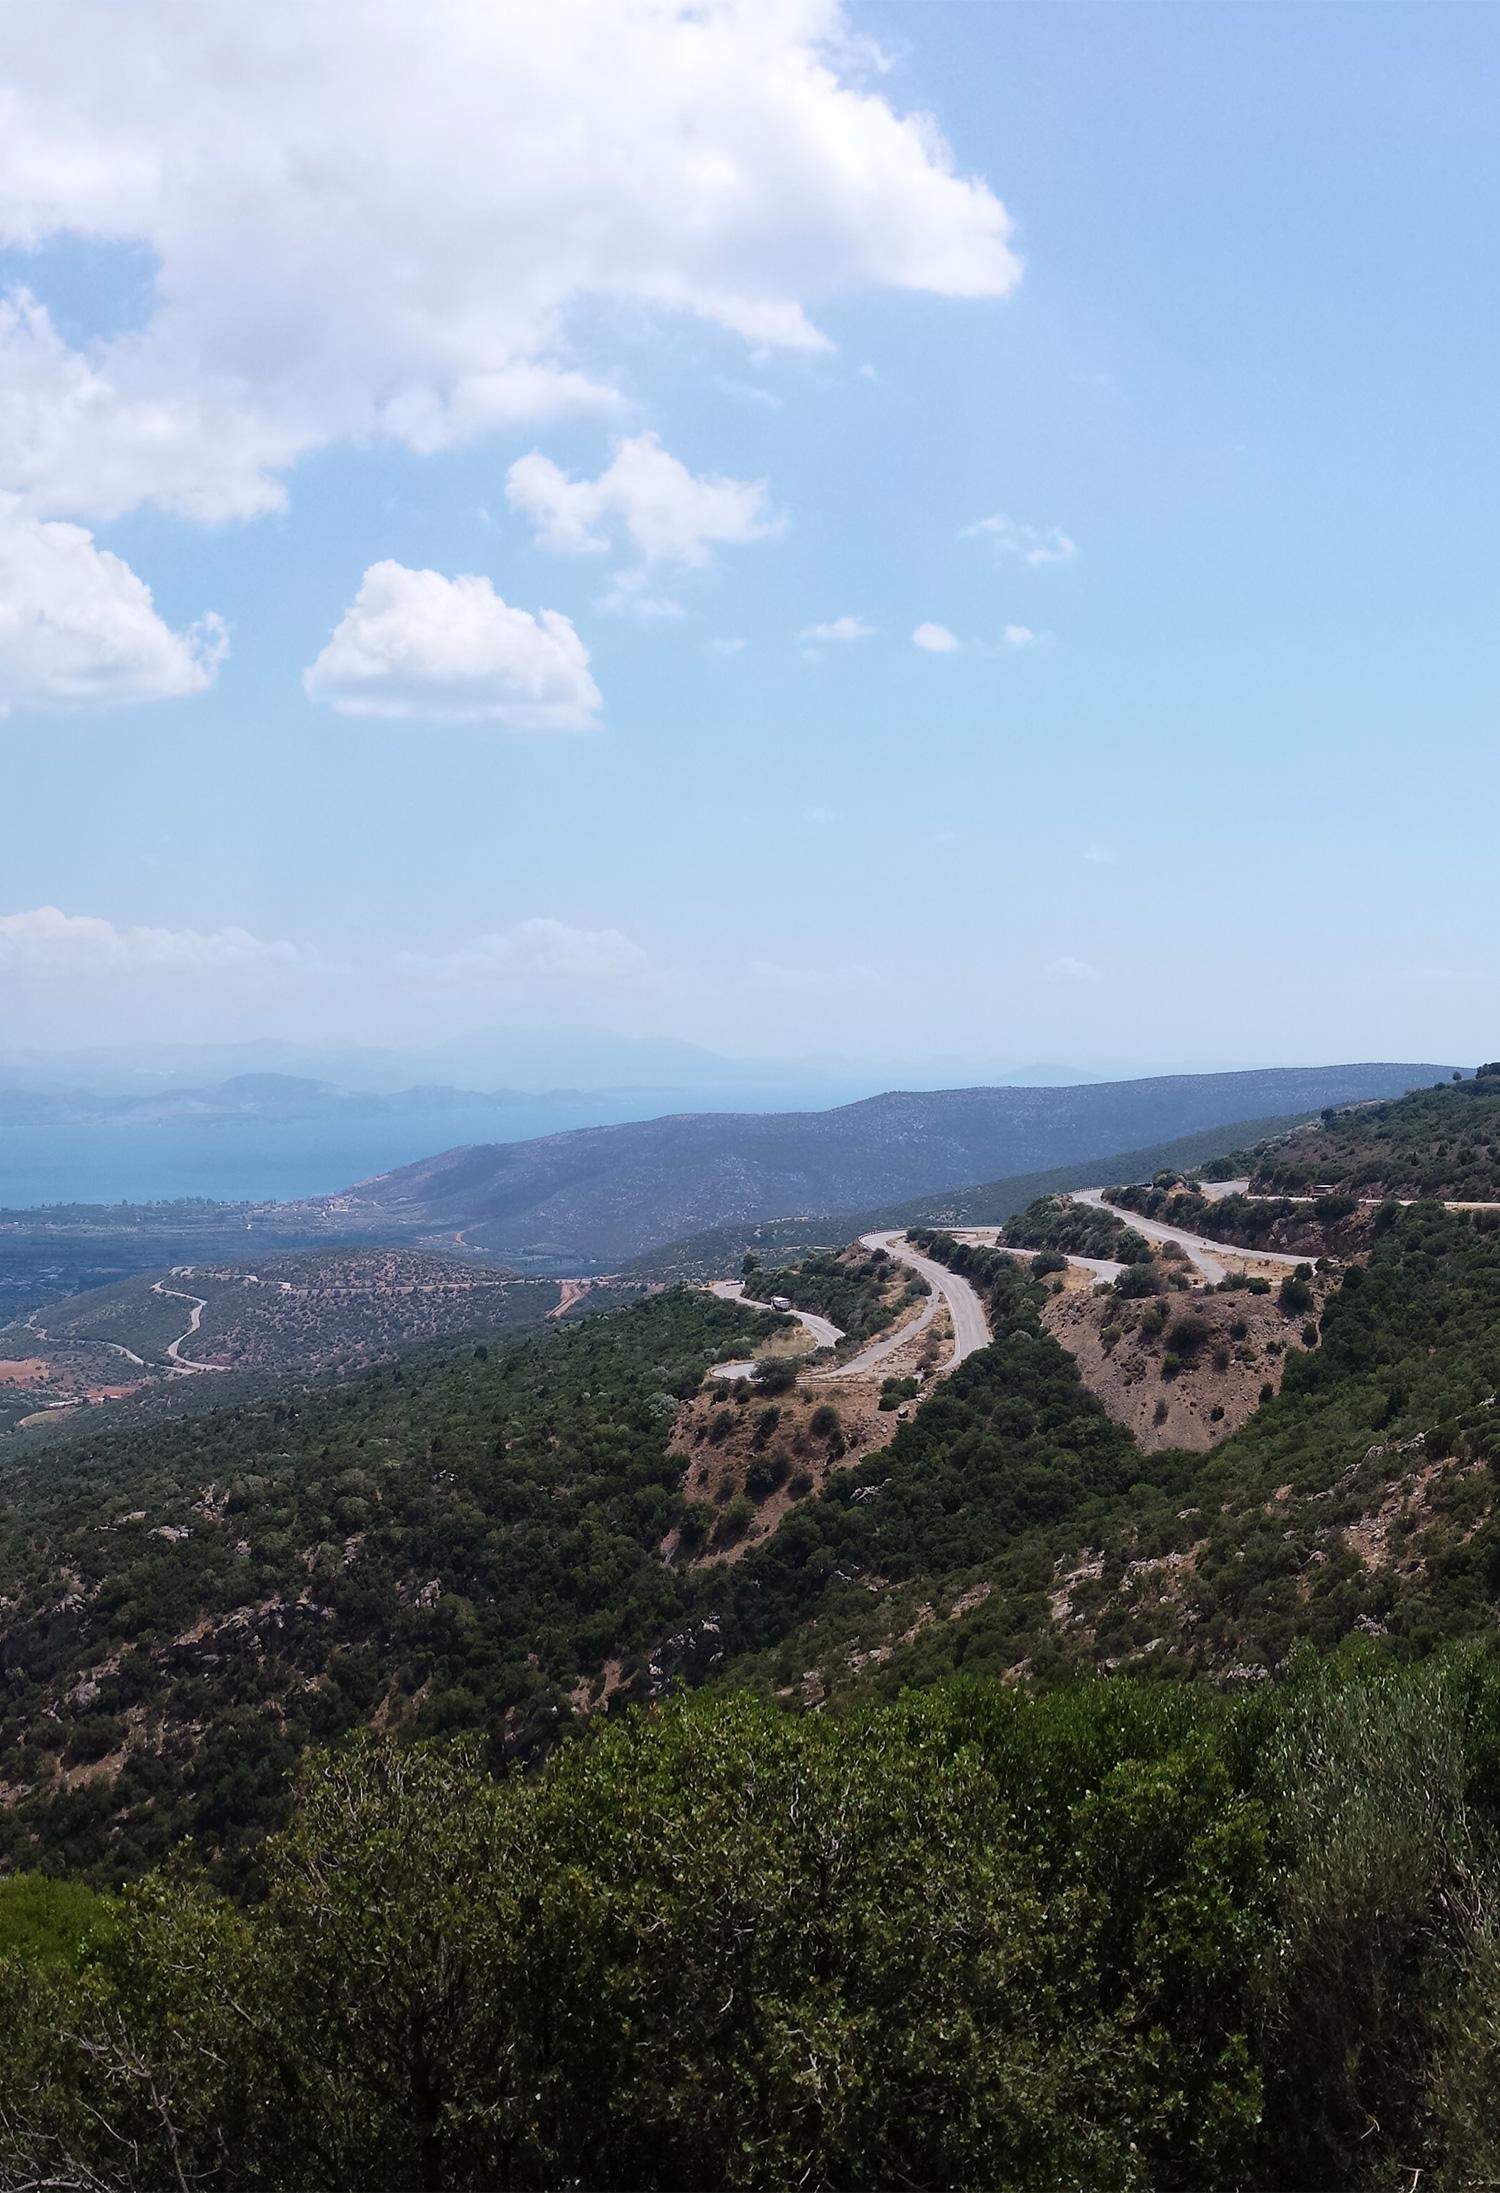 Kreikka_Peloponnesos_Parasta_matkalla_blogi